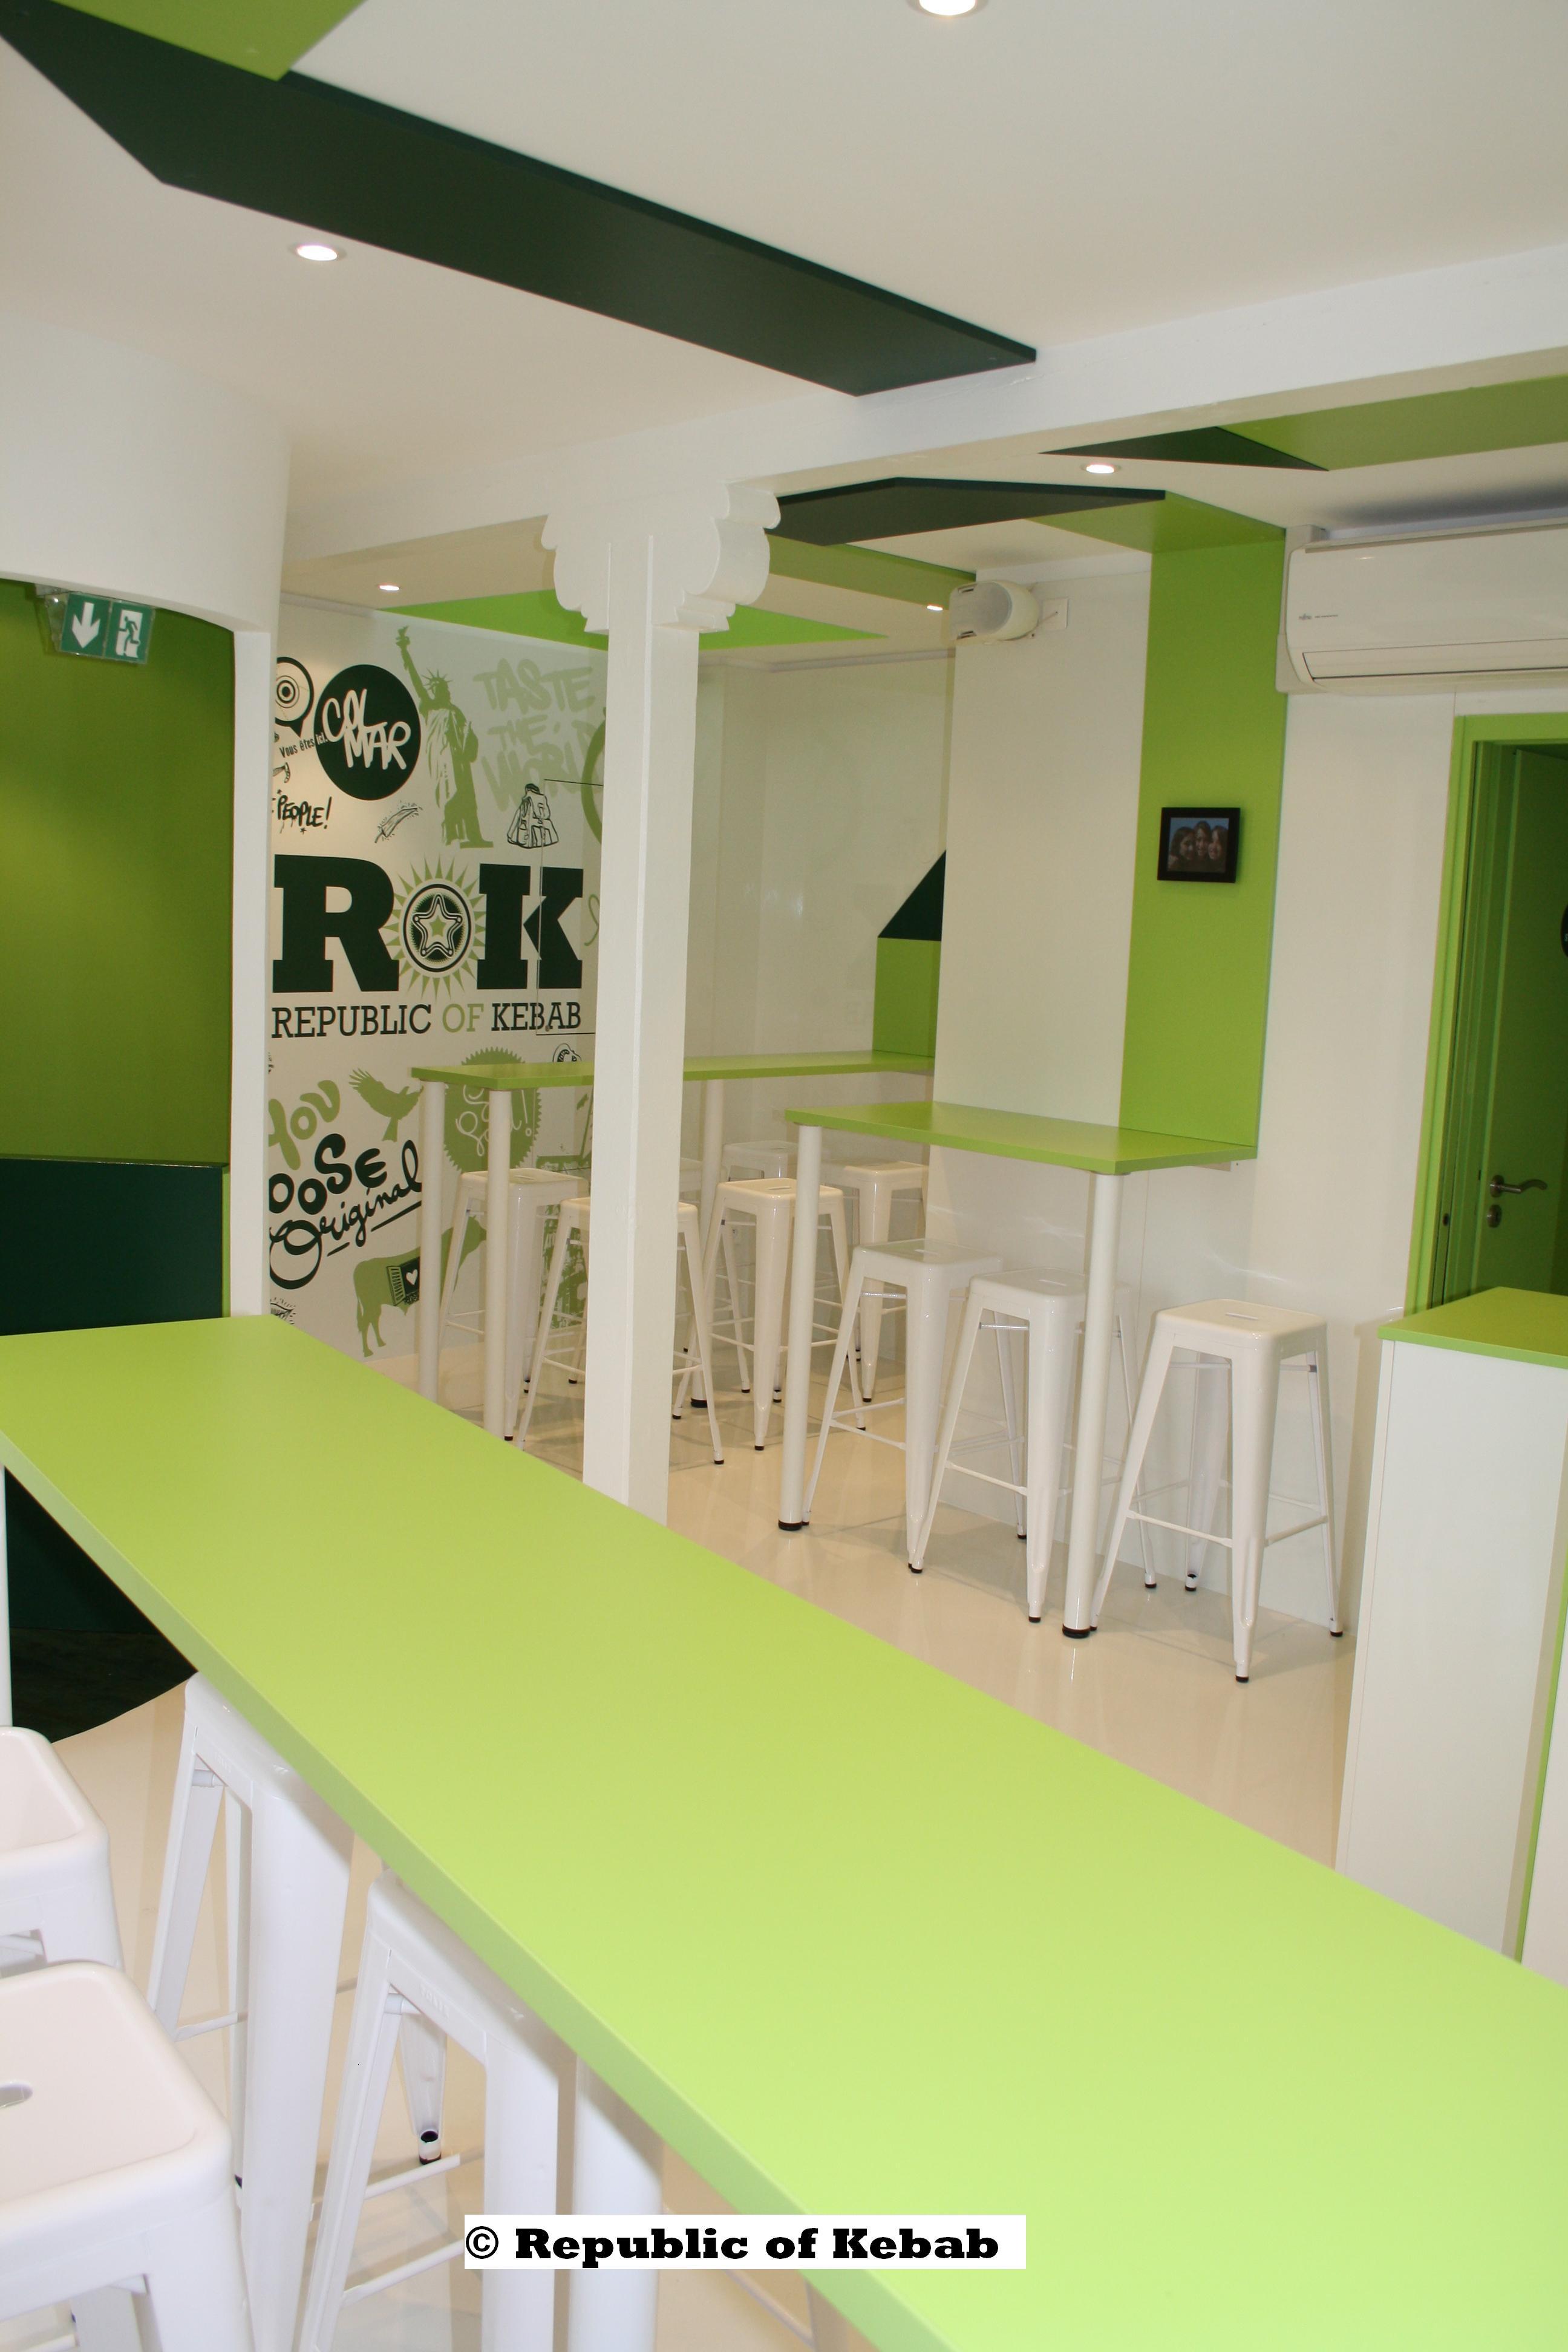 Rok - Republic Of Kebab